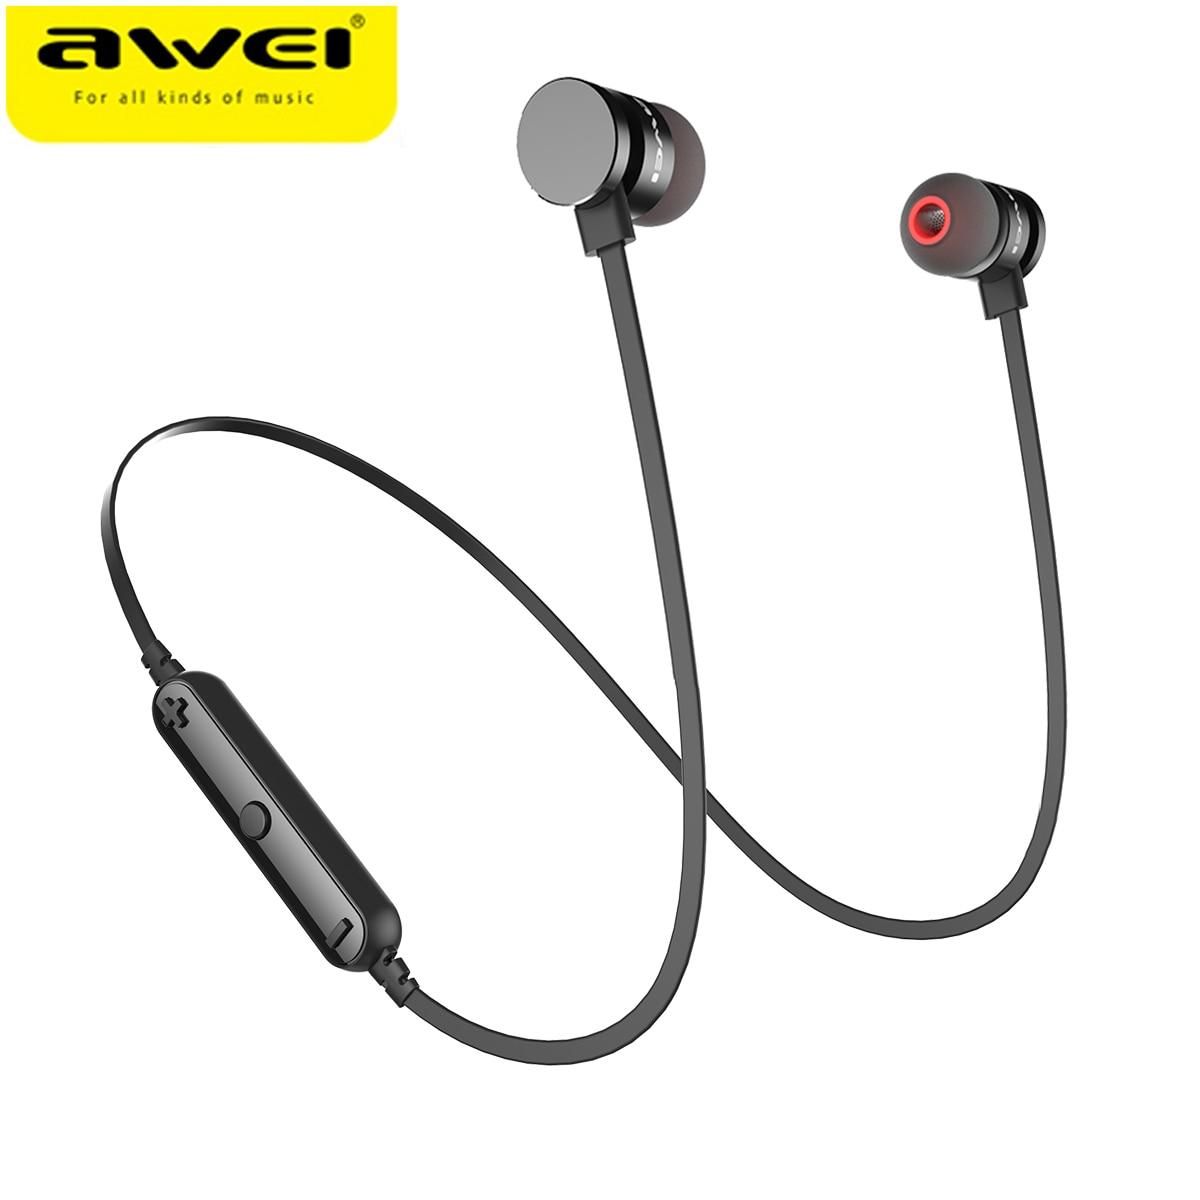 Più nuovo AWEI T11 Cuffia Senza Fili Auricolare Bluetooth Auricolare Fone de ouvido Cuffie Bluetooth Sport Musica V4.2 Casque